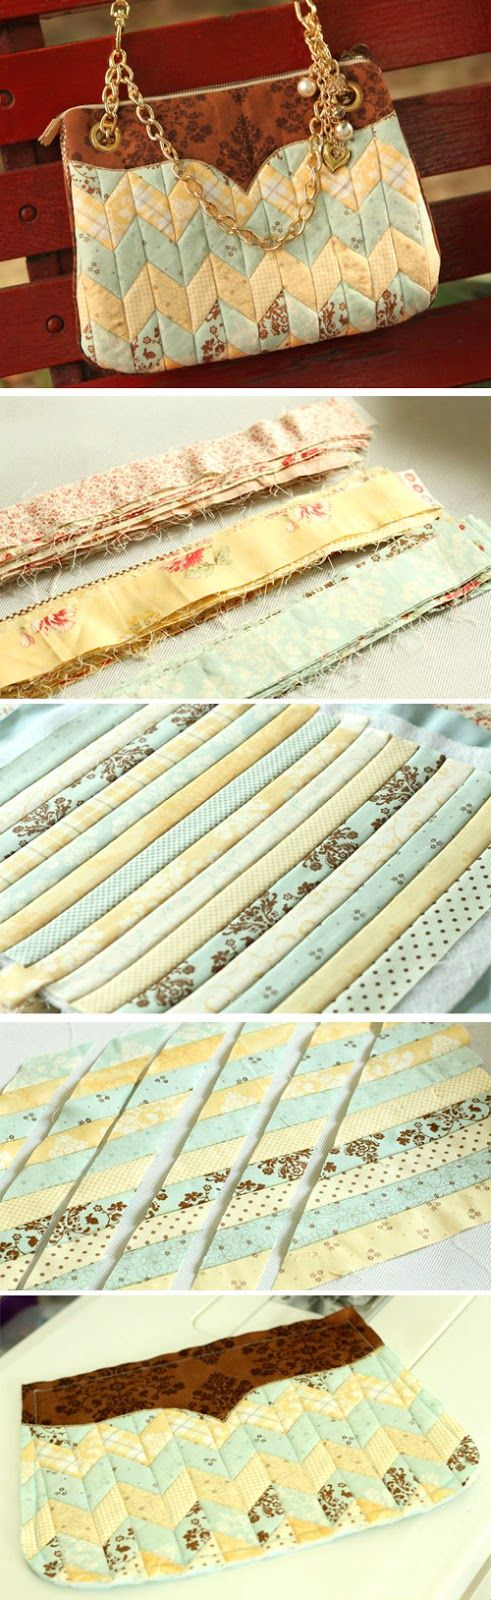 Bolso. http://www.handmadiya.com/2016/02/bag-of-fabric-strips.html